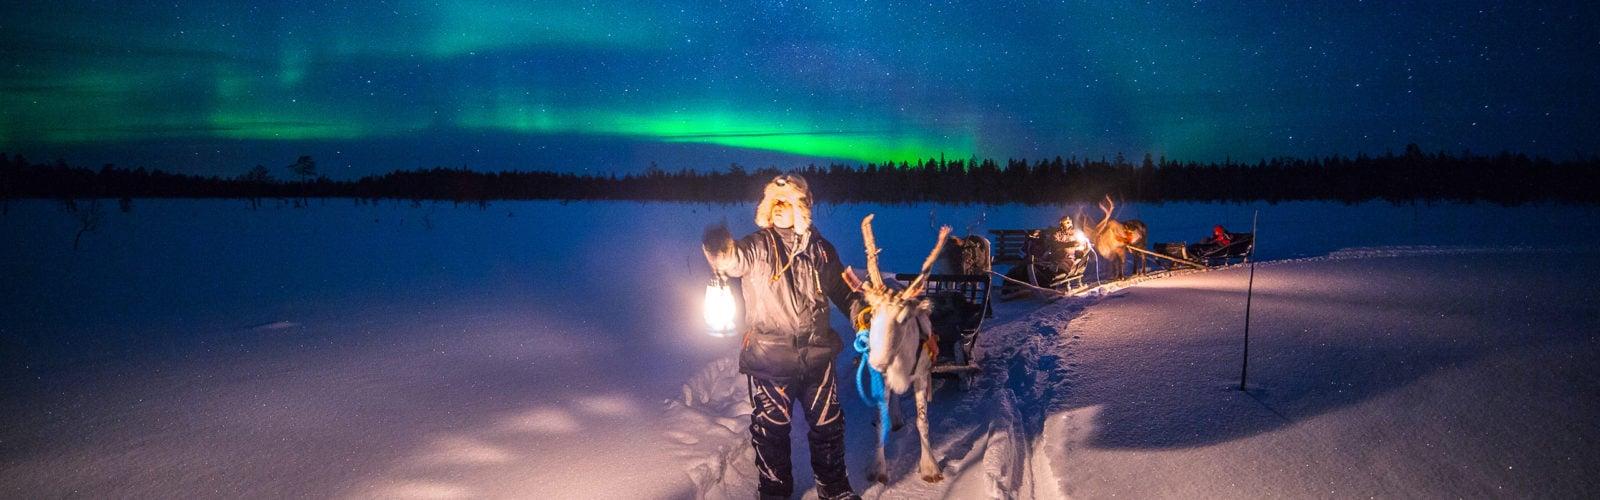 finnish-lapland-northern-light